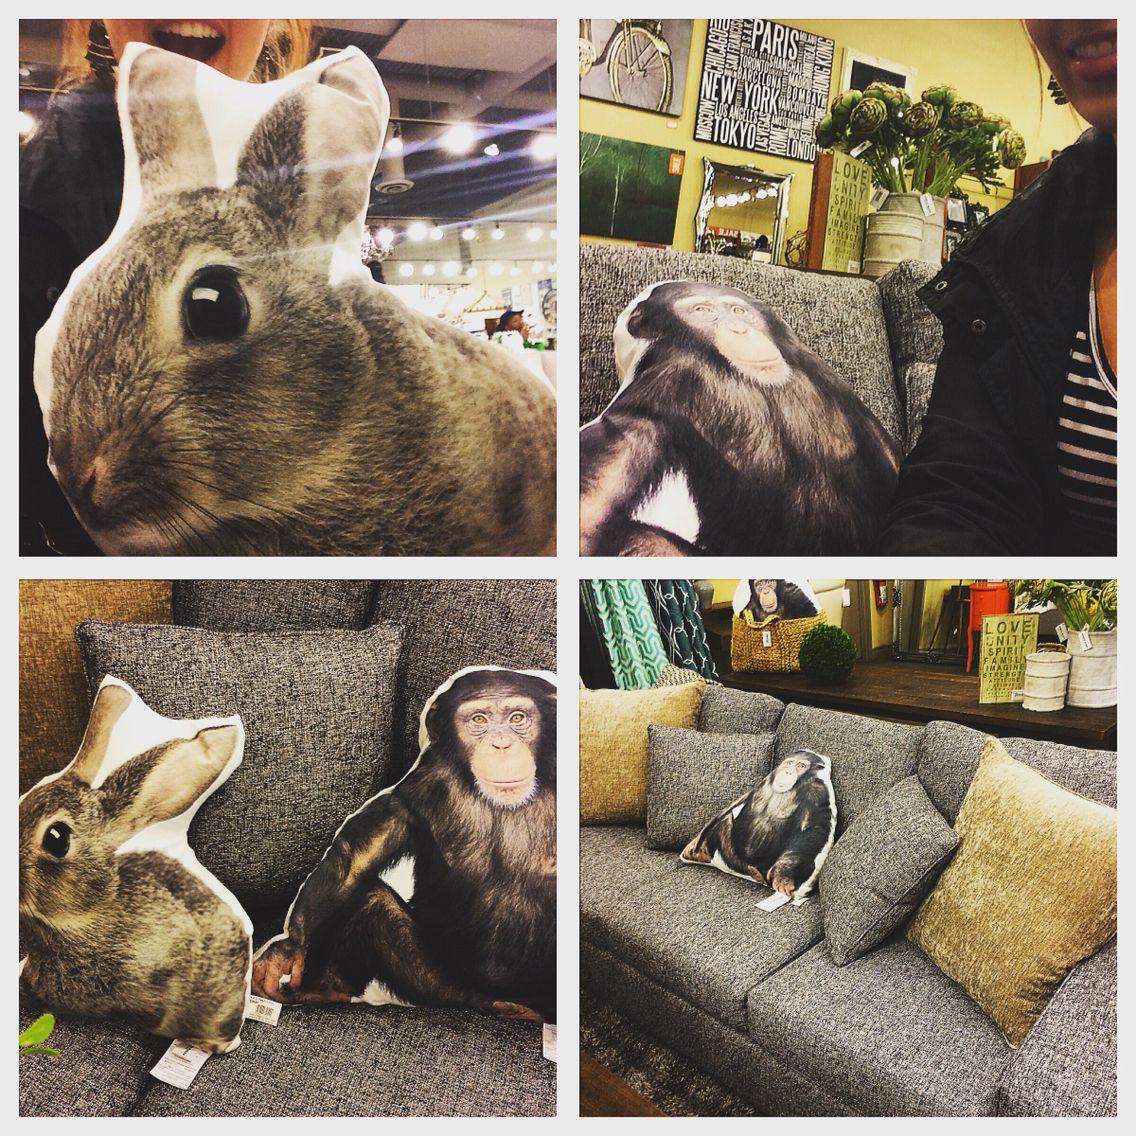 Monkey and rabbit Pillows